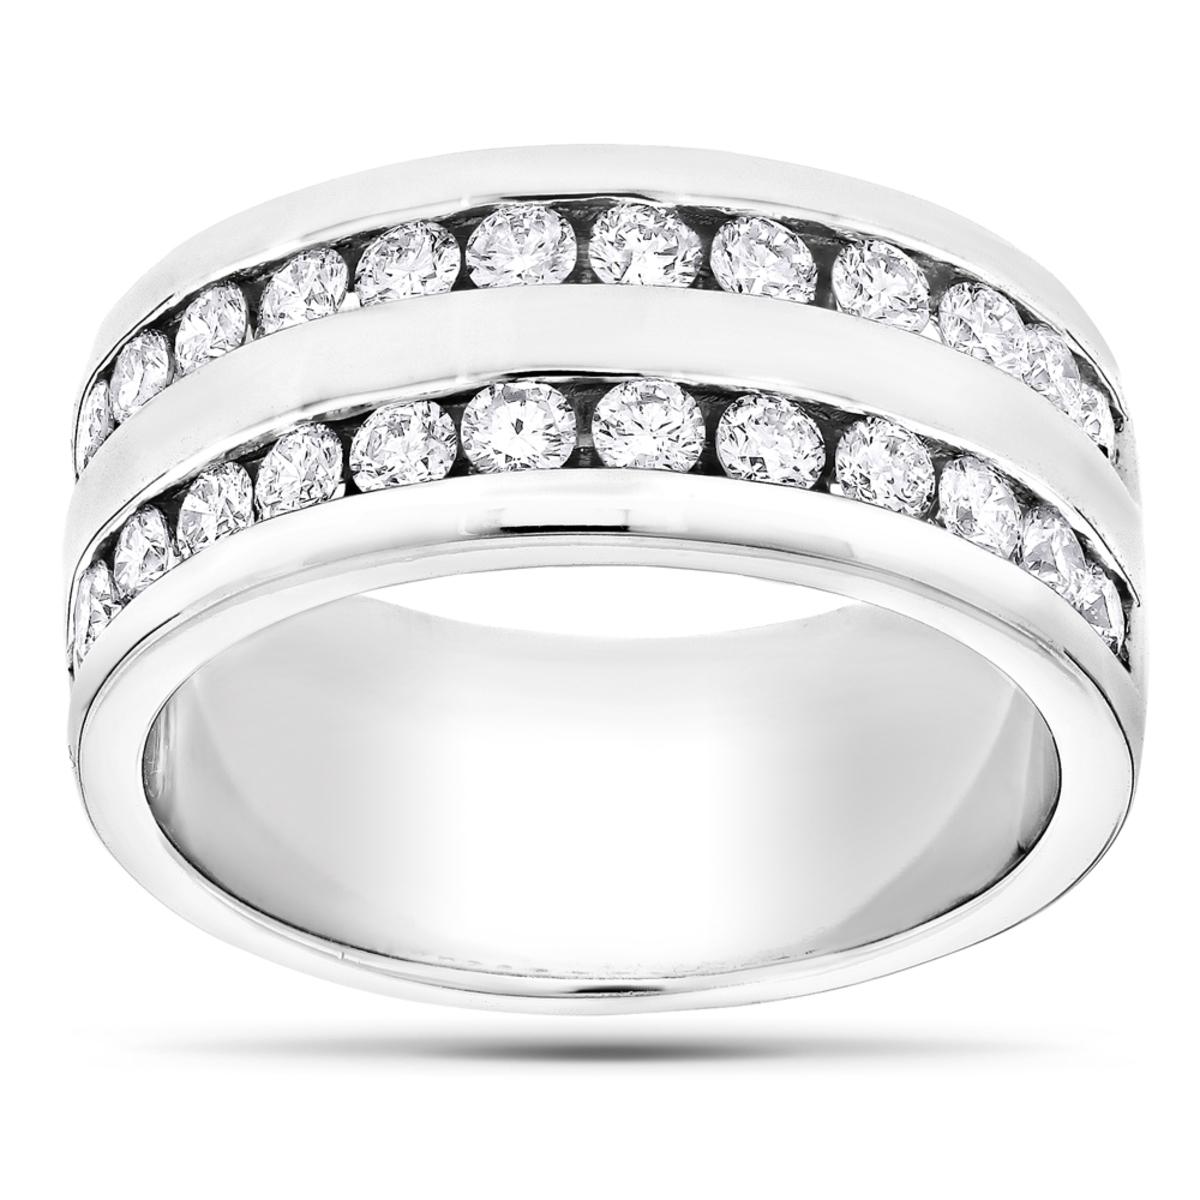 14K Gold Round Diamond Men's Wedding Ring 2.08ct